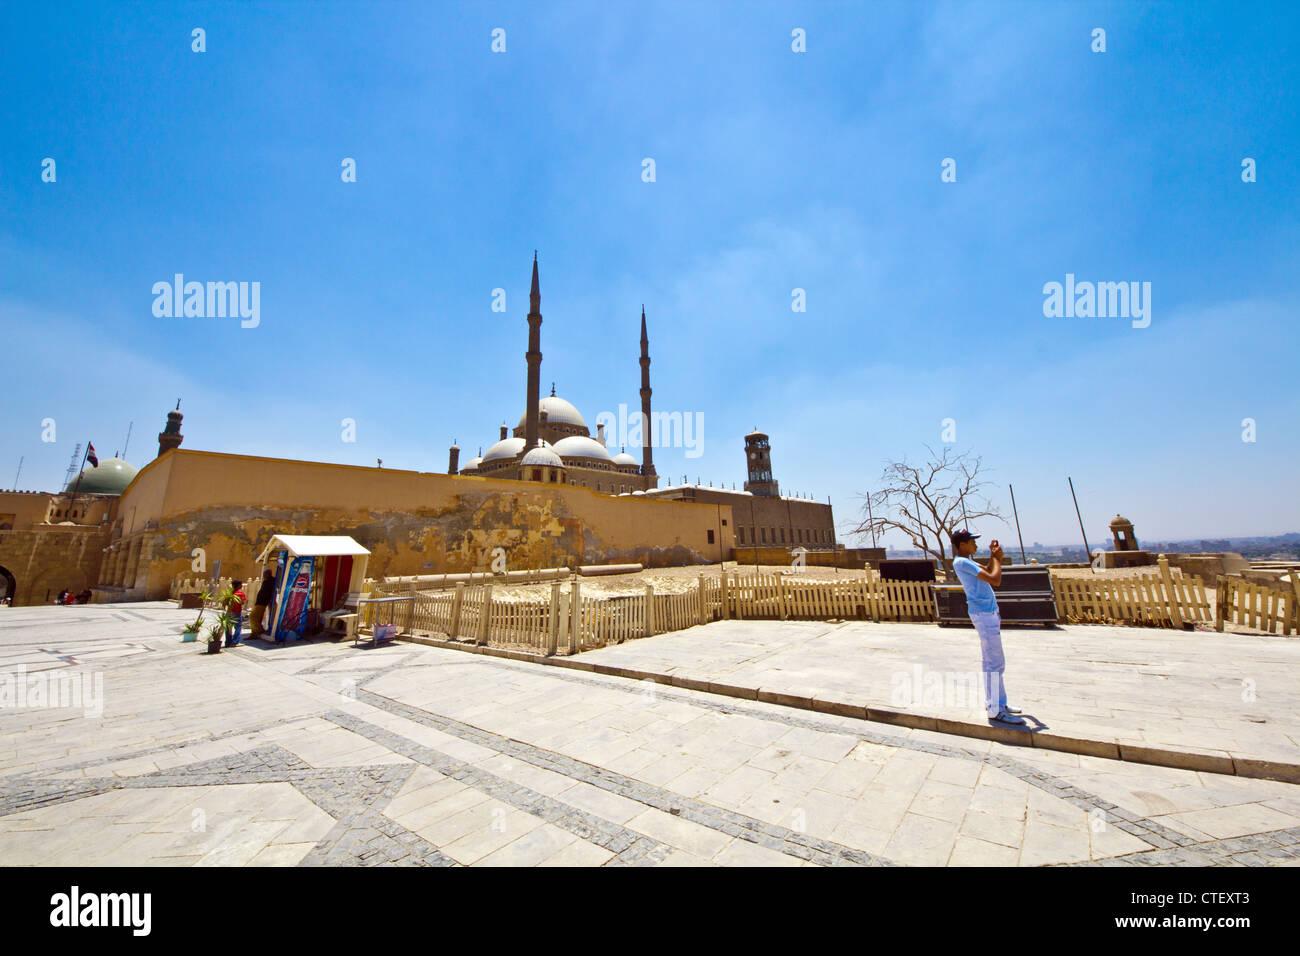 Muhammad Ali Mosque The Citadel Cairo Egypt - Stock Image